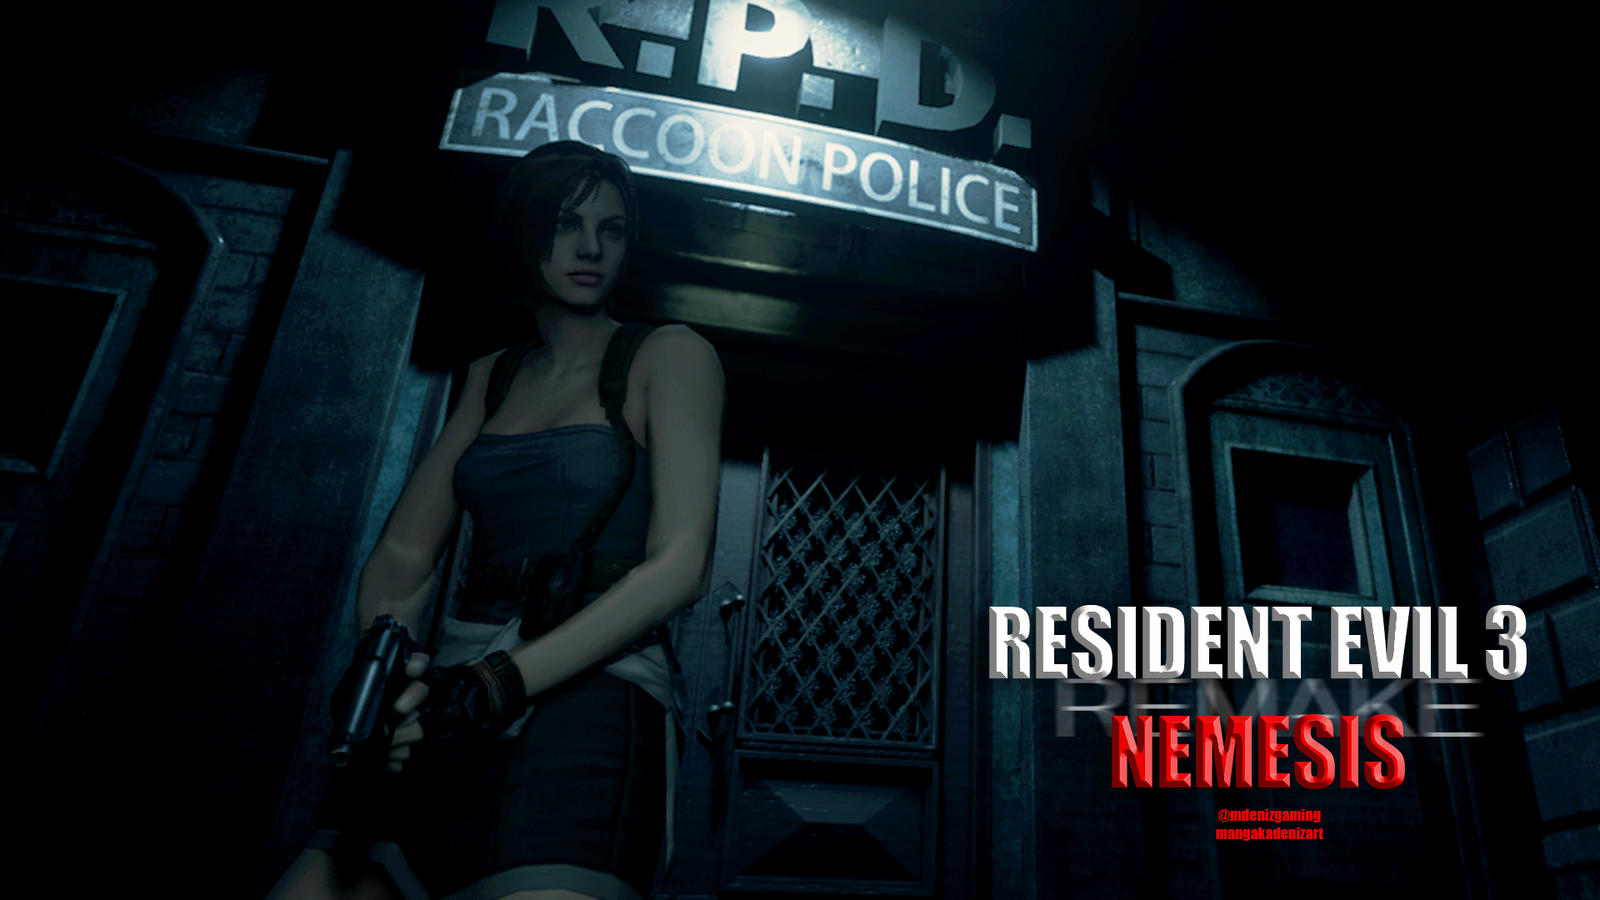 Resident Evil 3 Remake Wallpaper By Me 2 By Lazymanga Ka On